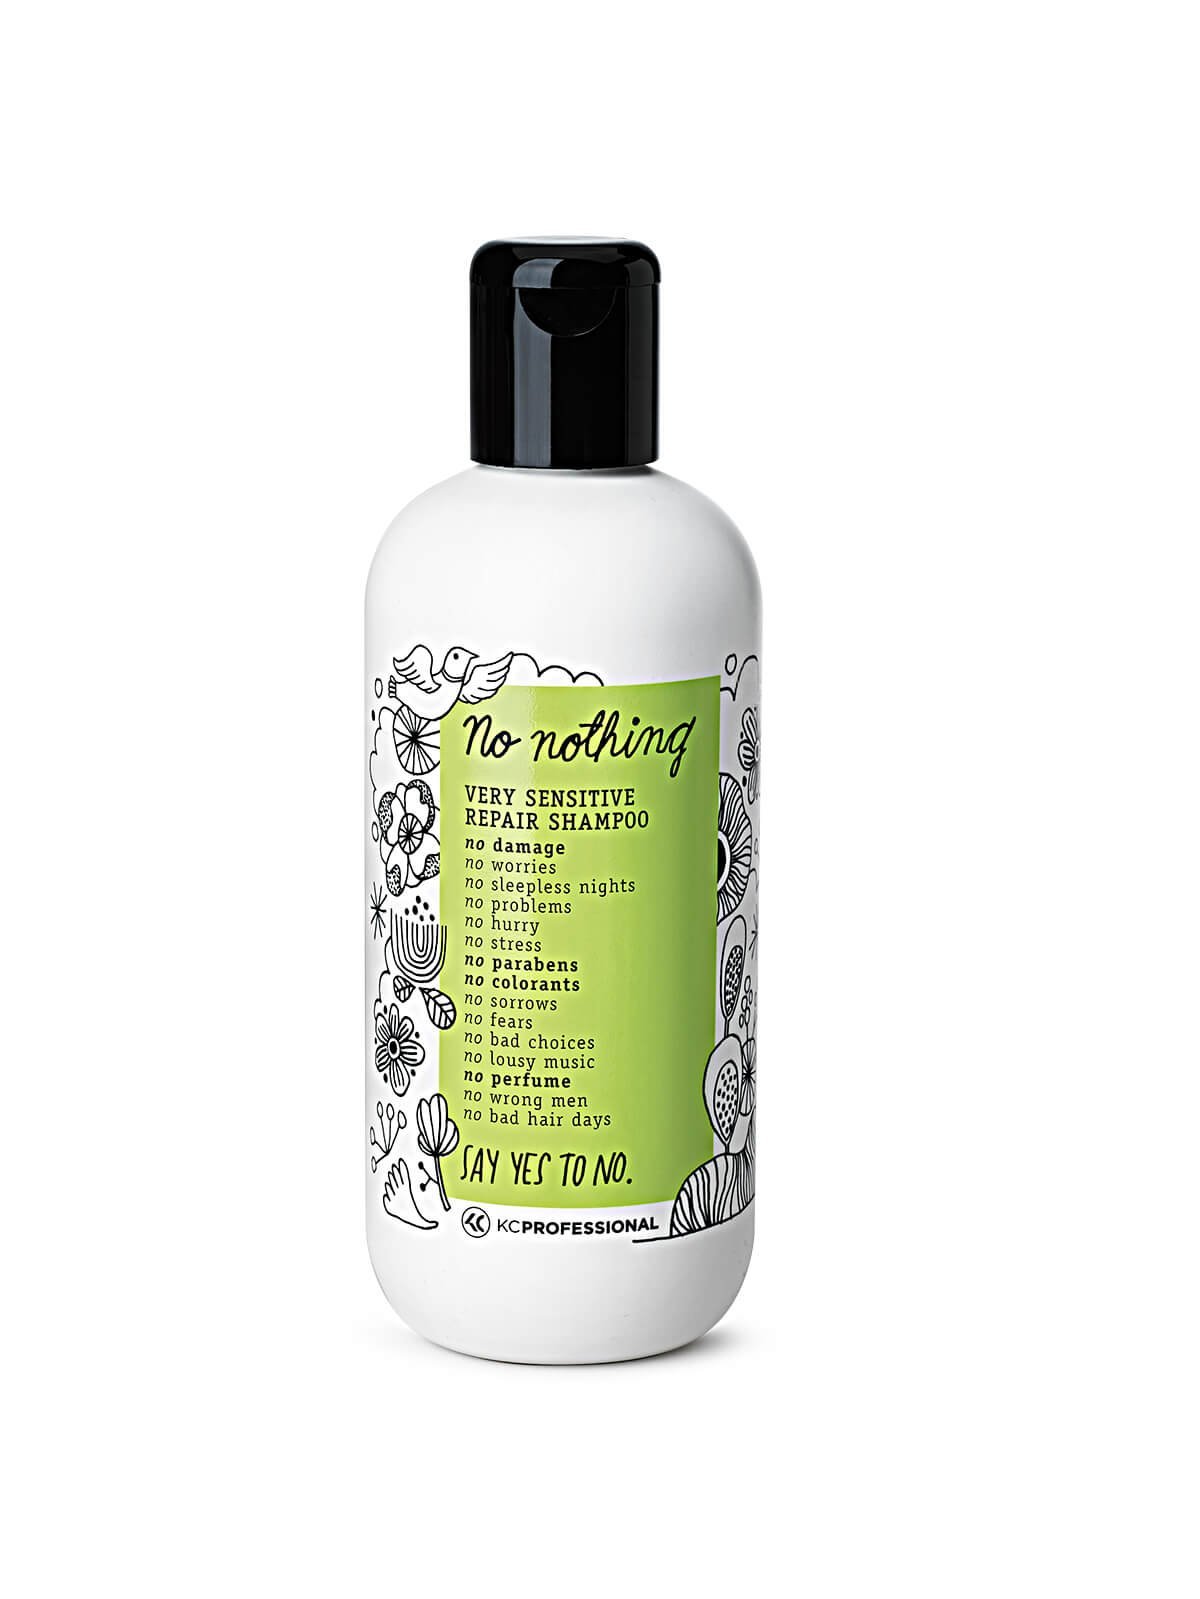 No Nothing Very Sensitive Repair Shampoo - 100% Vegan, Hypoallergenic, Fragrance Free, Paraben Free – 10.15 oz